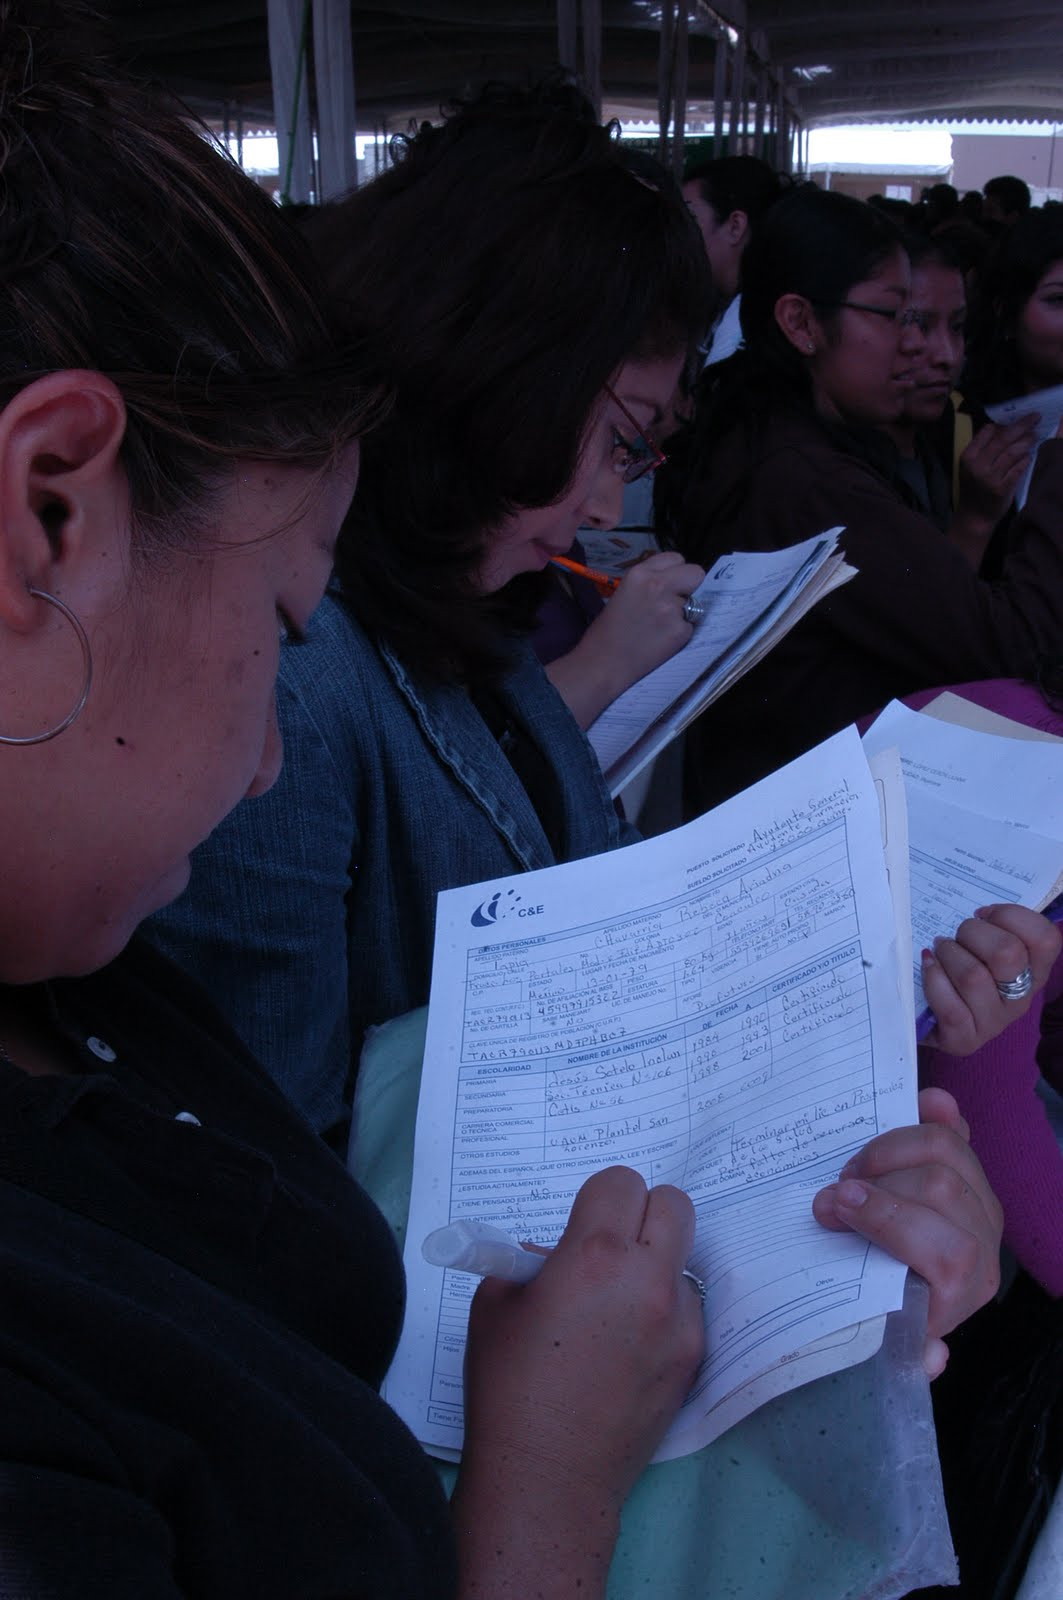 Faltaron plazas de nivel licenciatura en feria del empleo de Coacalco